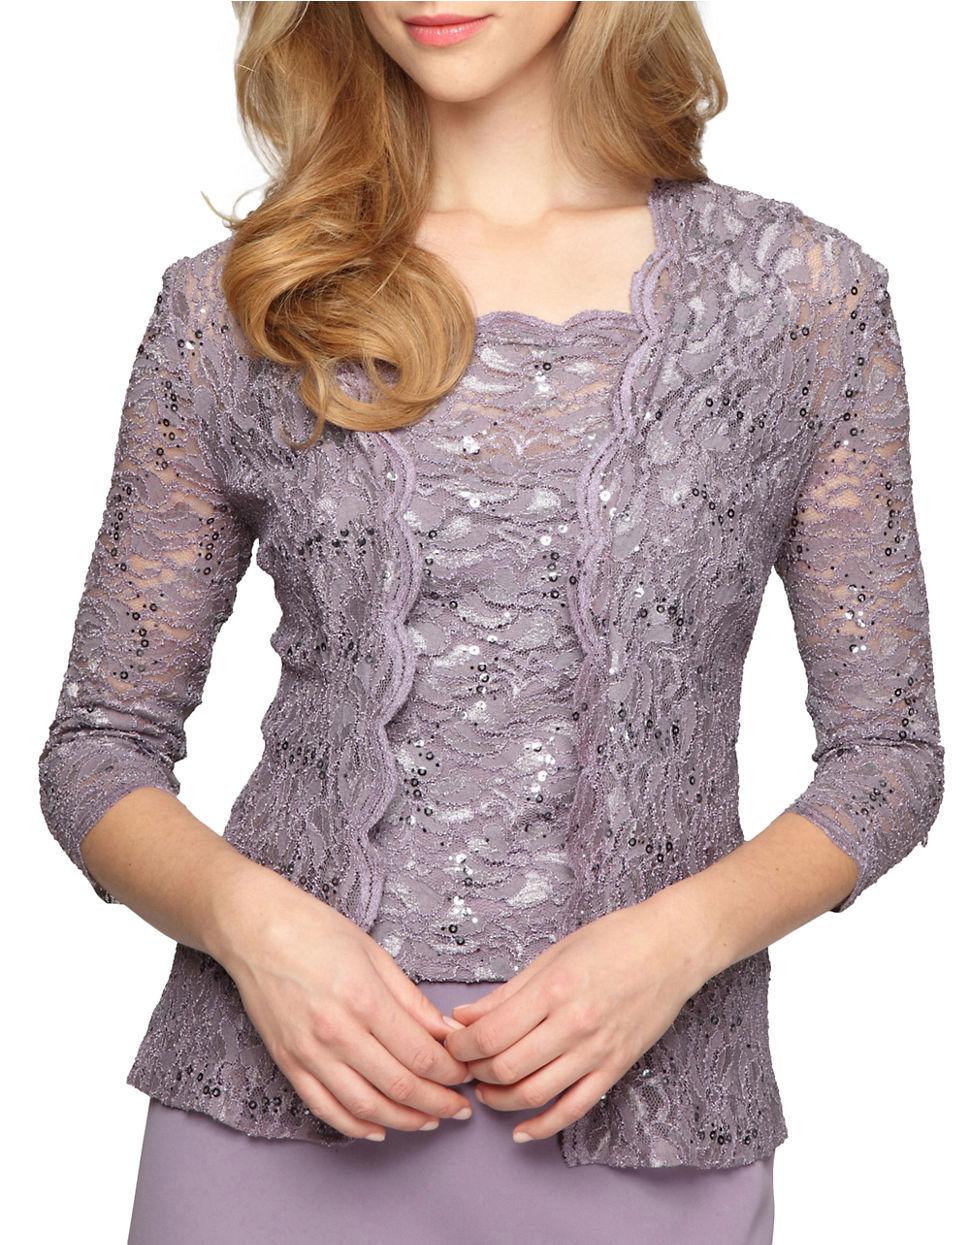 a91f4a65d130be Alex Evenings Jackets for Women – Fashion dresses